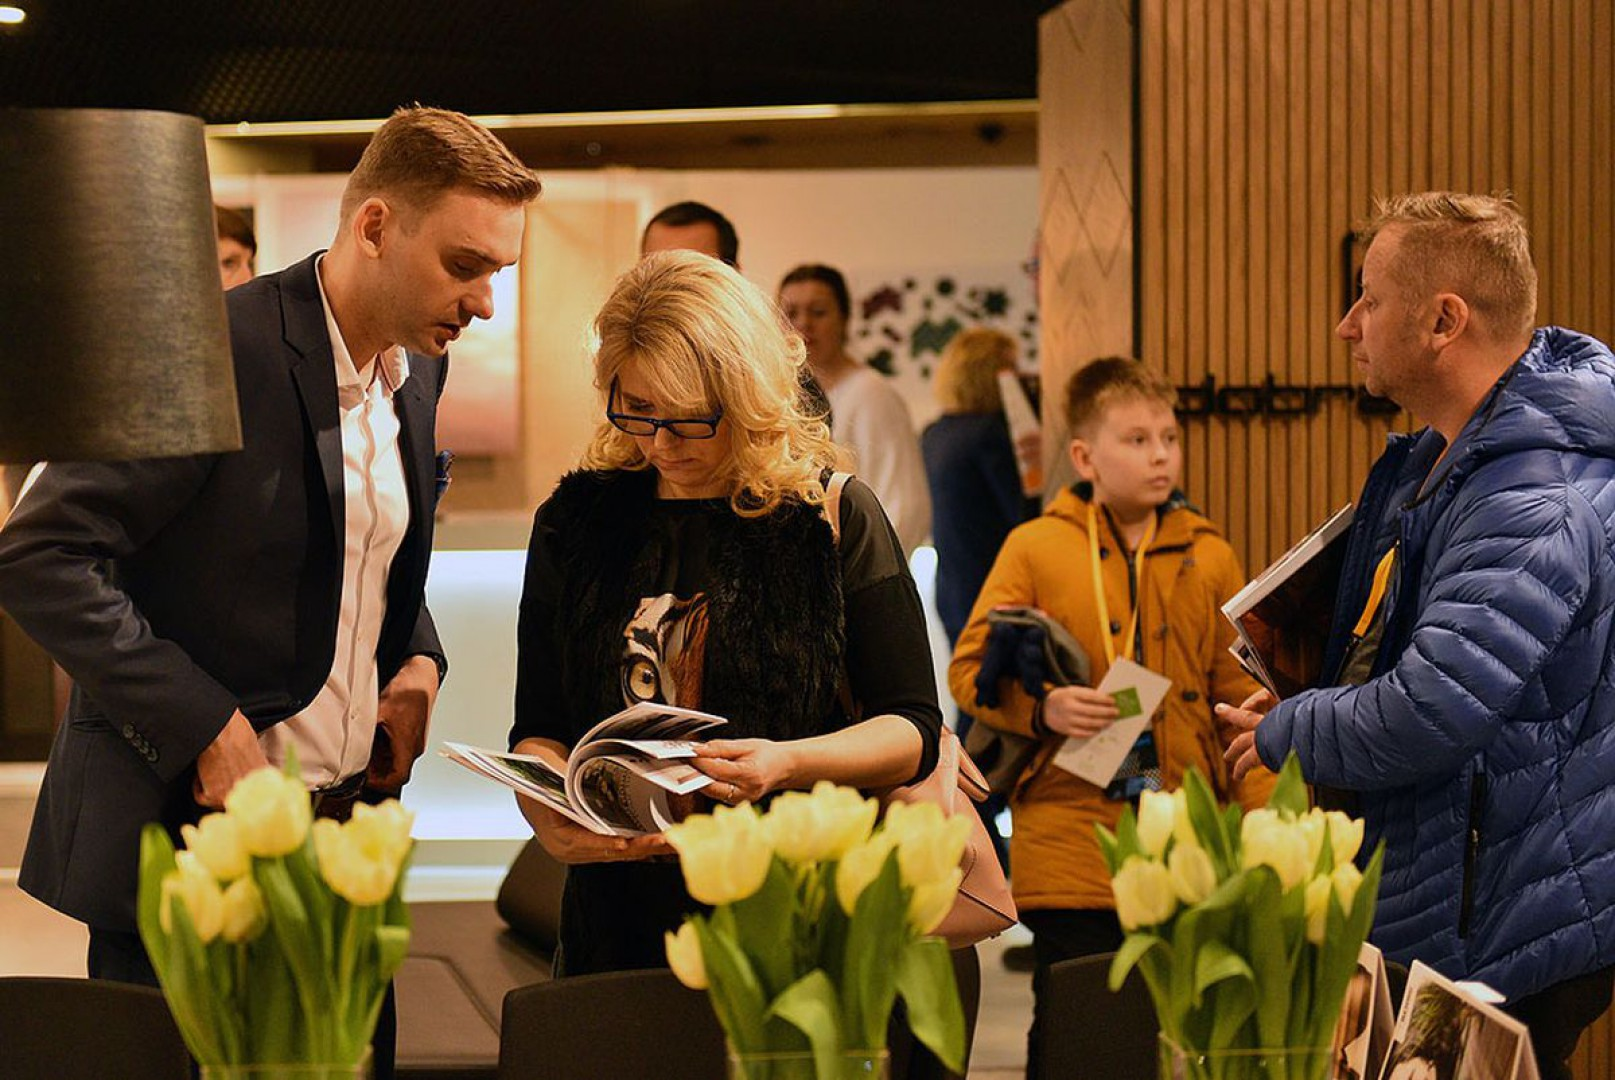 Dni Otwarte na 4 Design Days 2018 (17-18 luty br.). Fot. Grupa PTWP